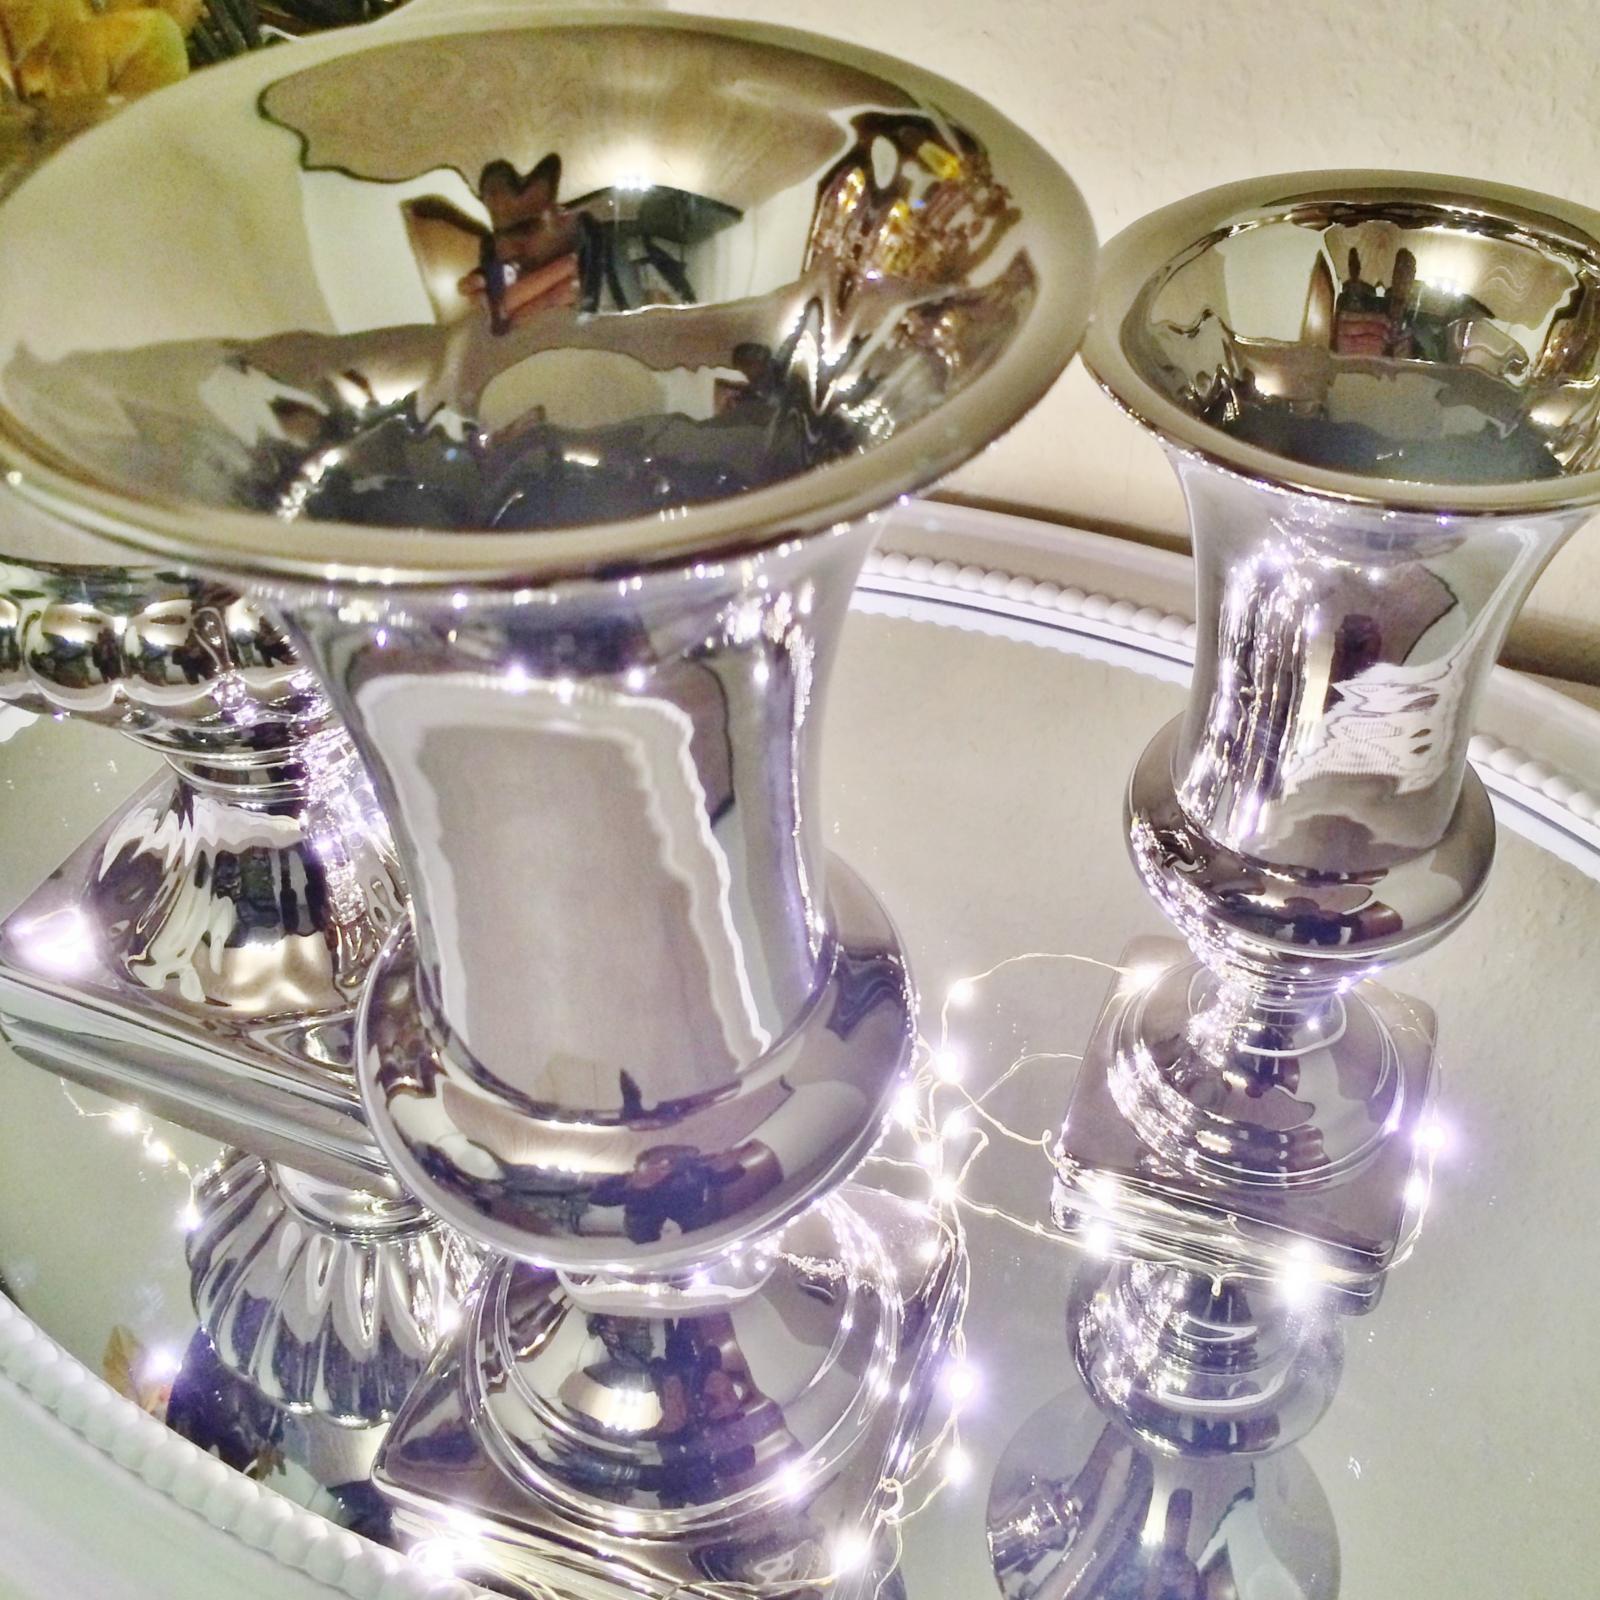 3 various vases modern extravagant ceramic deco dekovase. Black Bedroom Furniture Sets. Home Design Ideas